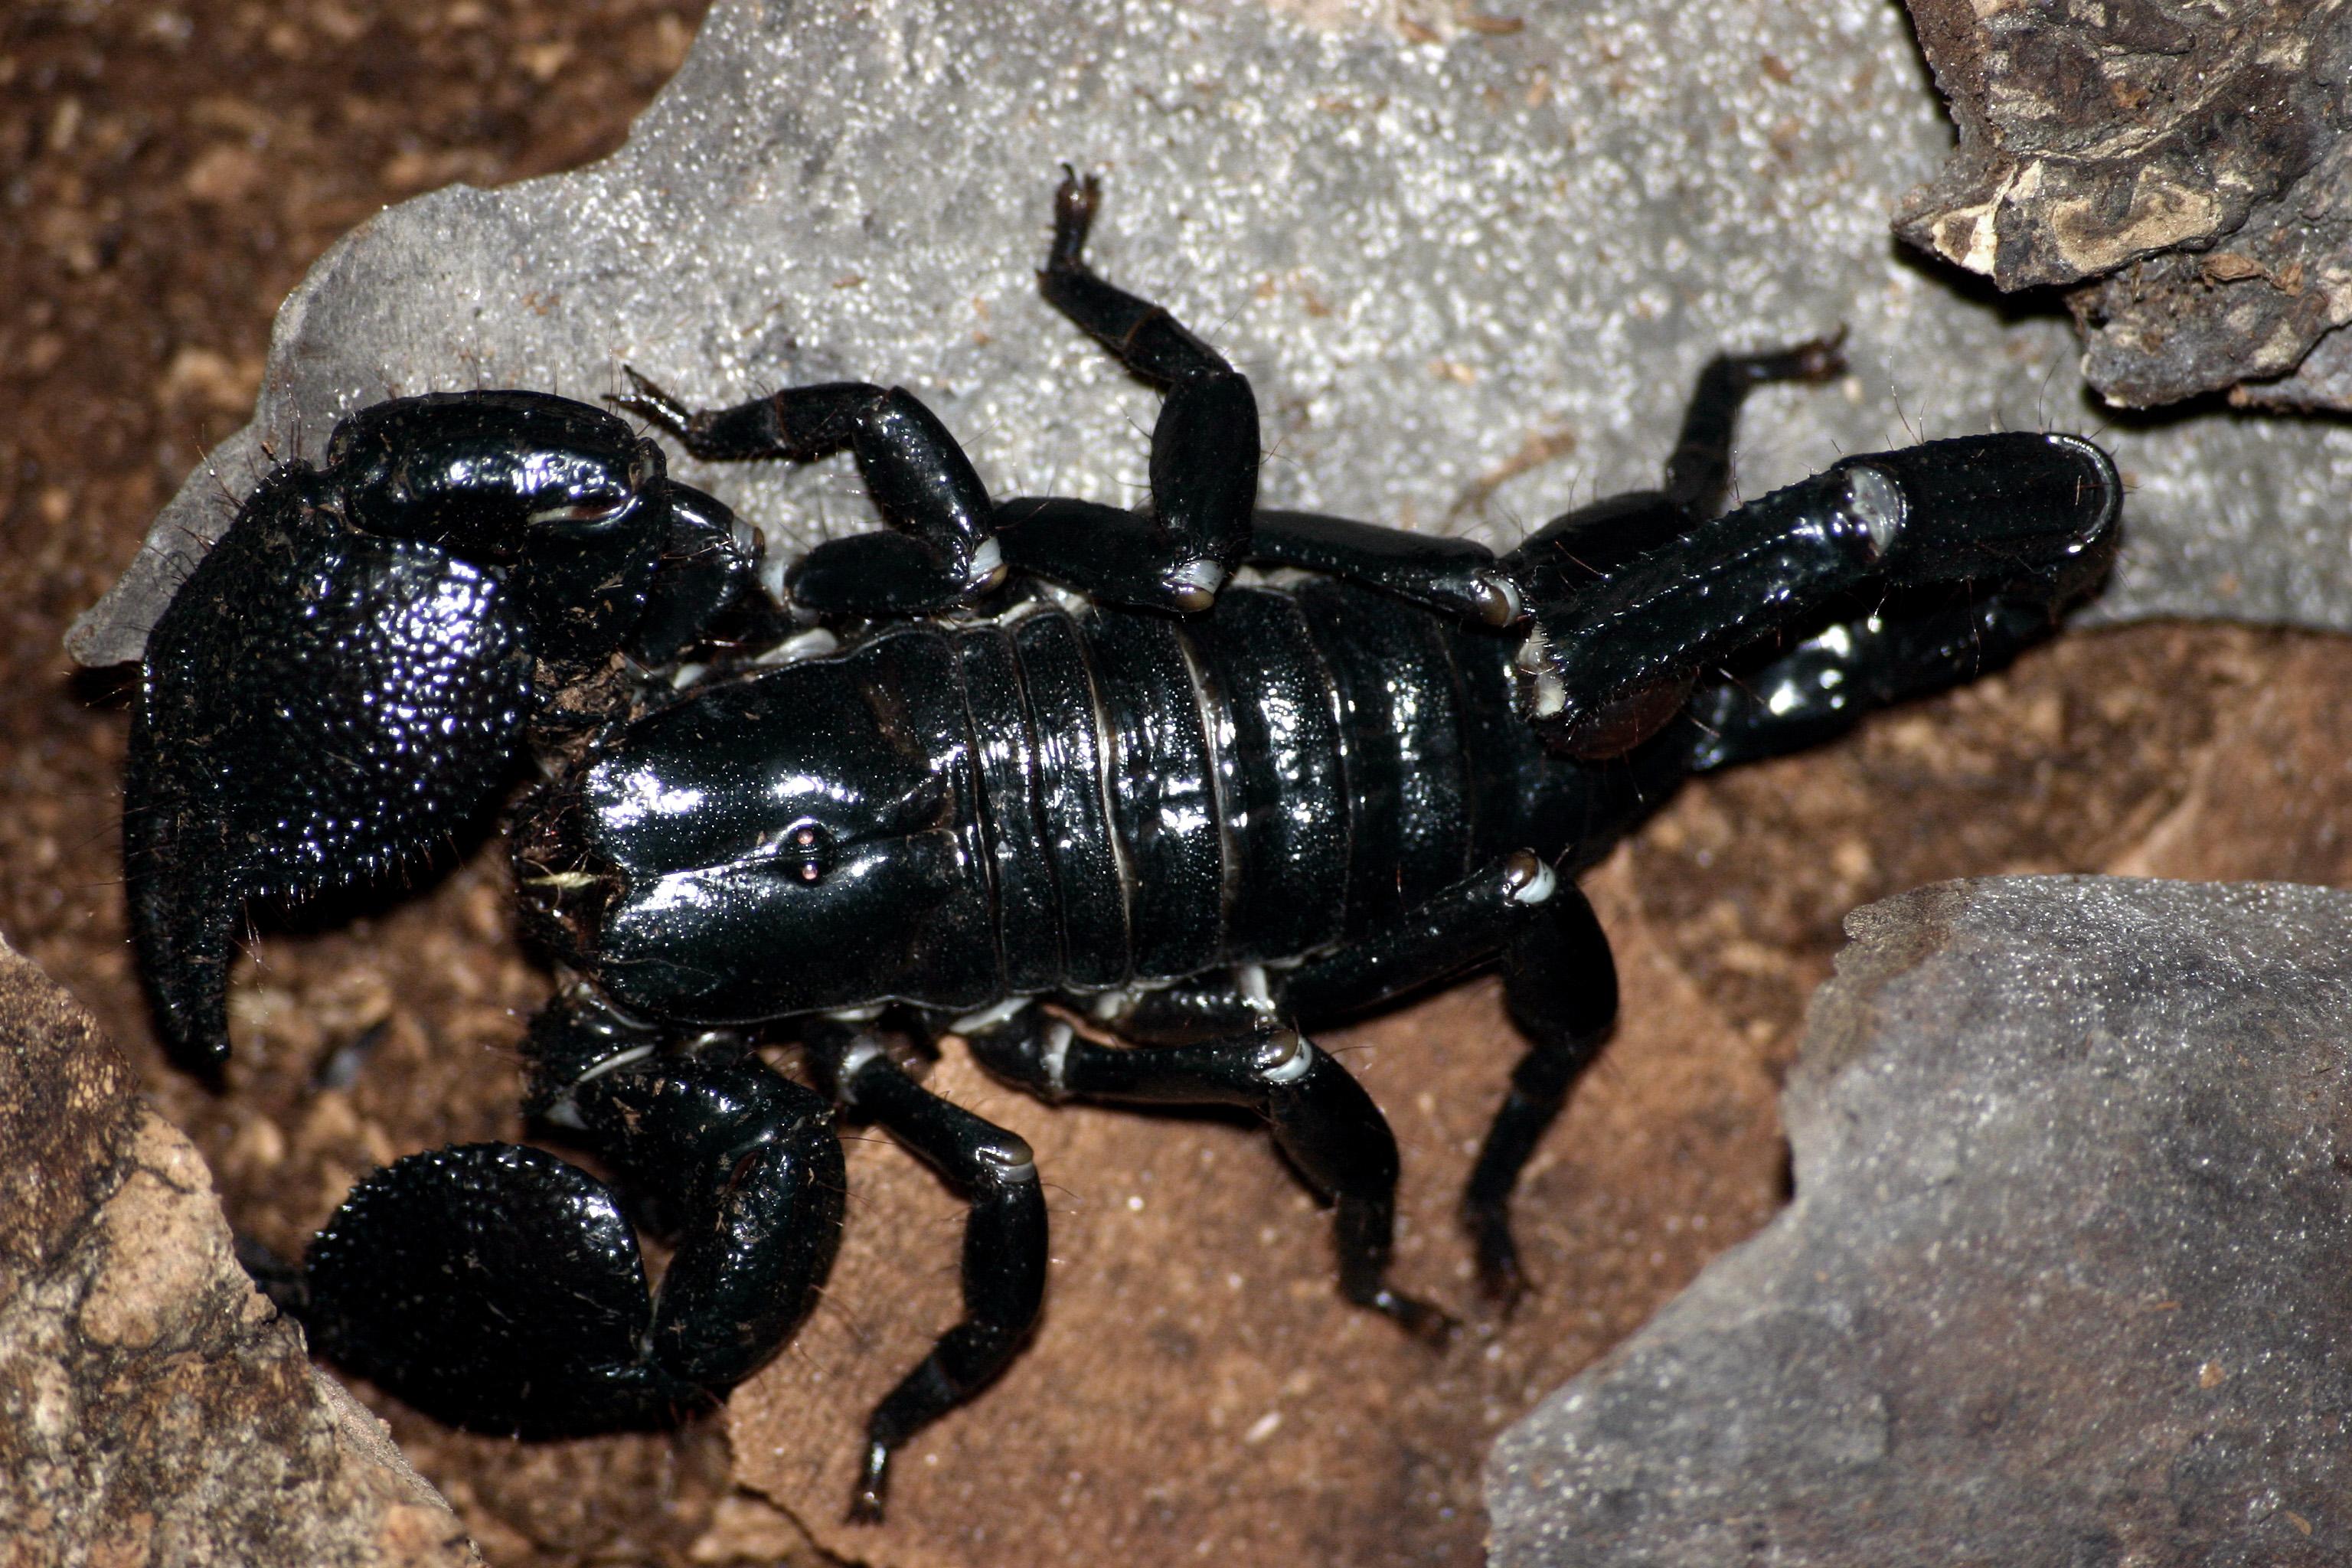 Aninimal Book: File:Emporer scorpion.jpg - Wikipedia